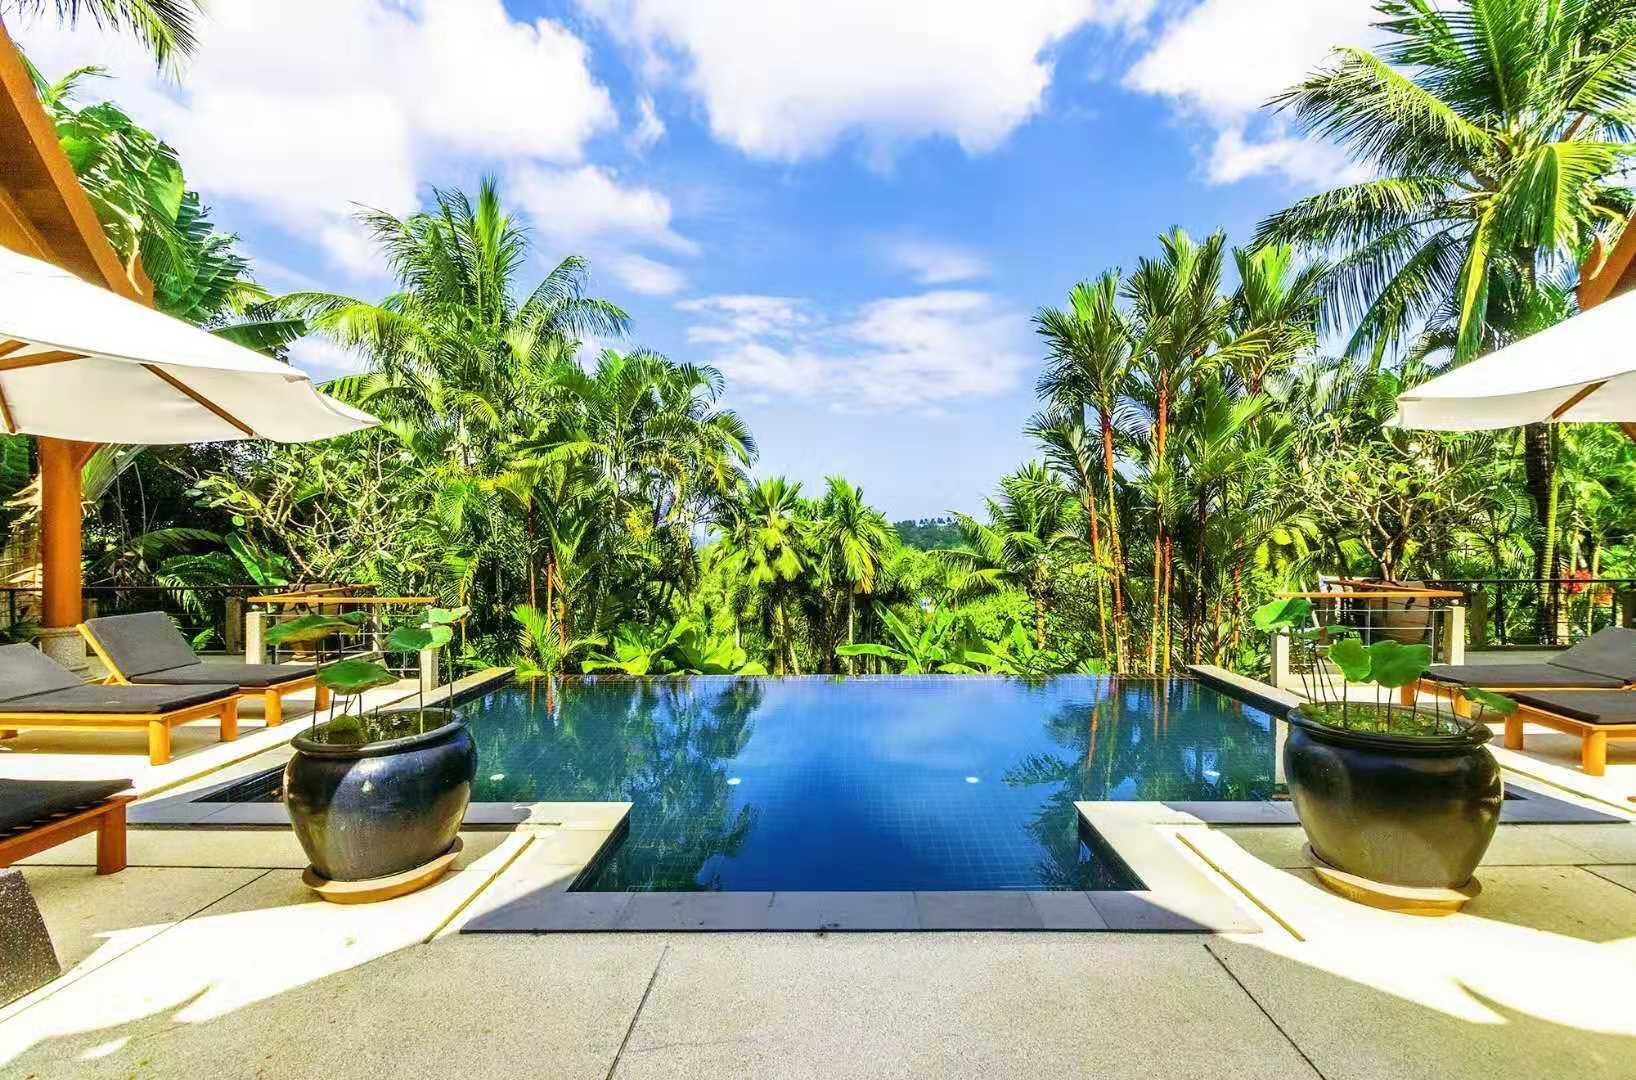 Luxury Four Bedroom Villa In Bangtao And Surin Beach